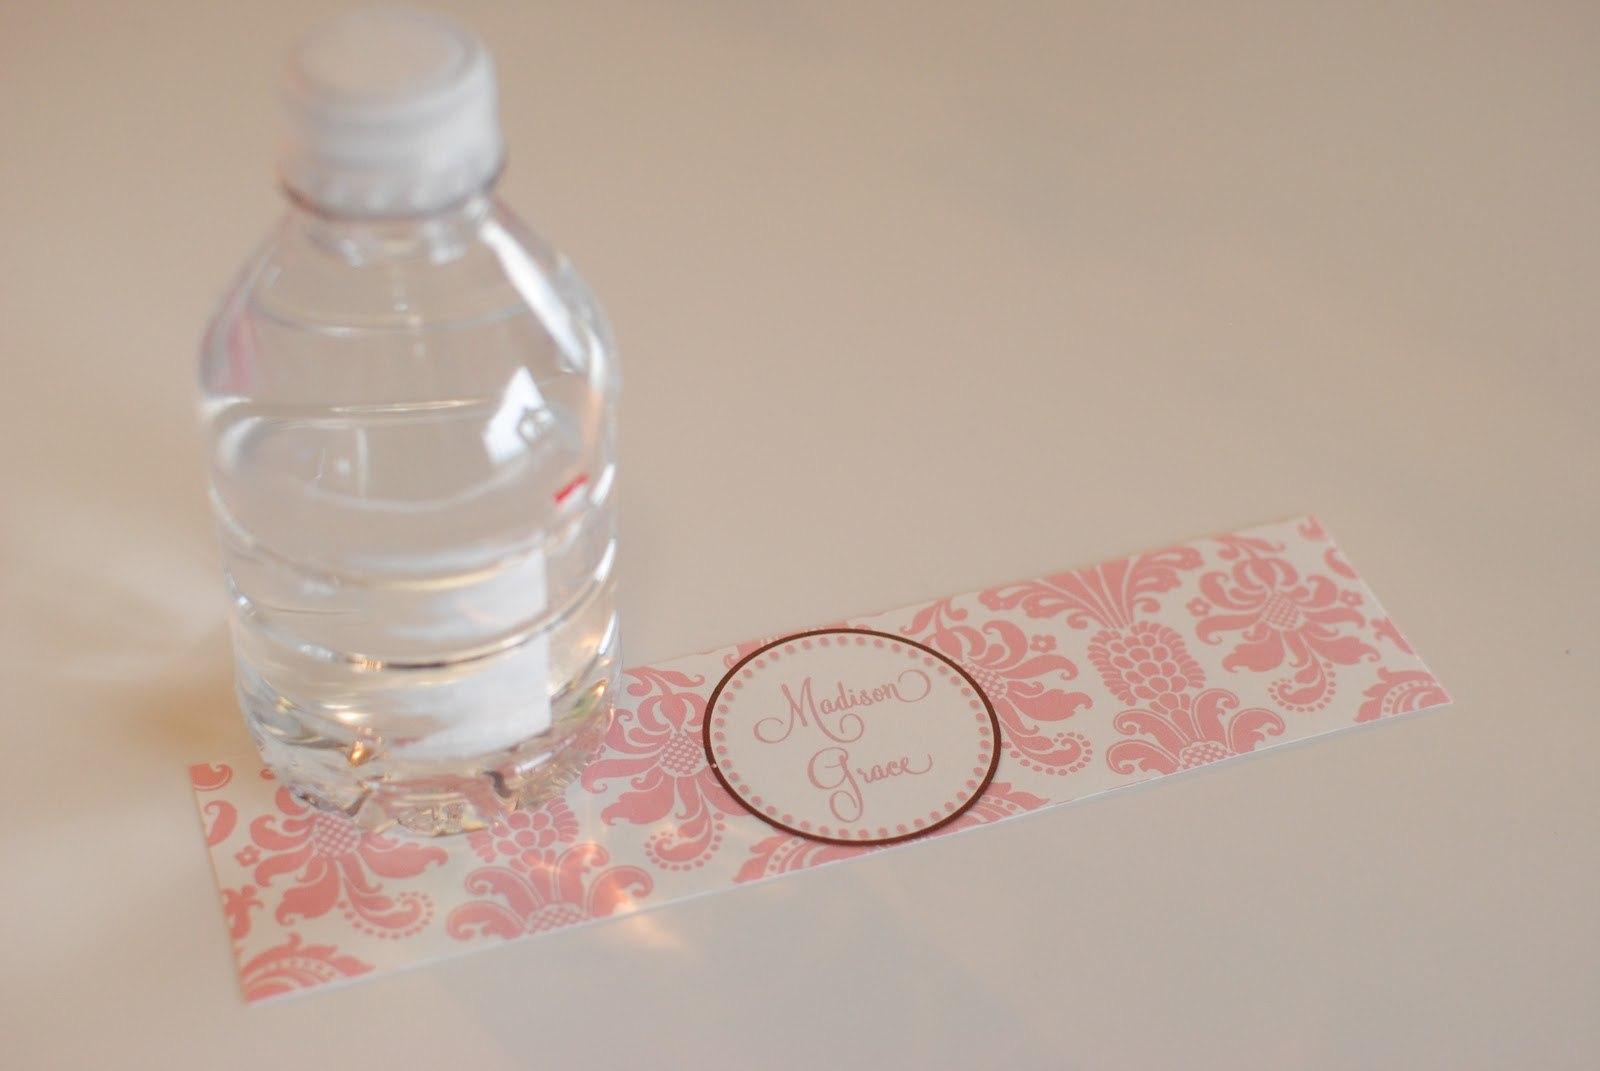 Life Sweet Life Diy Printable Water Bottle Labels Intended For Diy Water Bottle Label Template